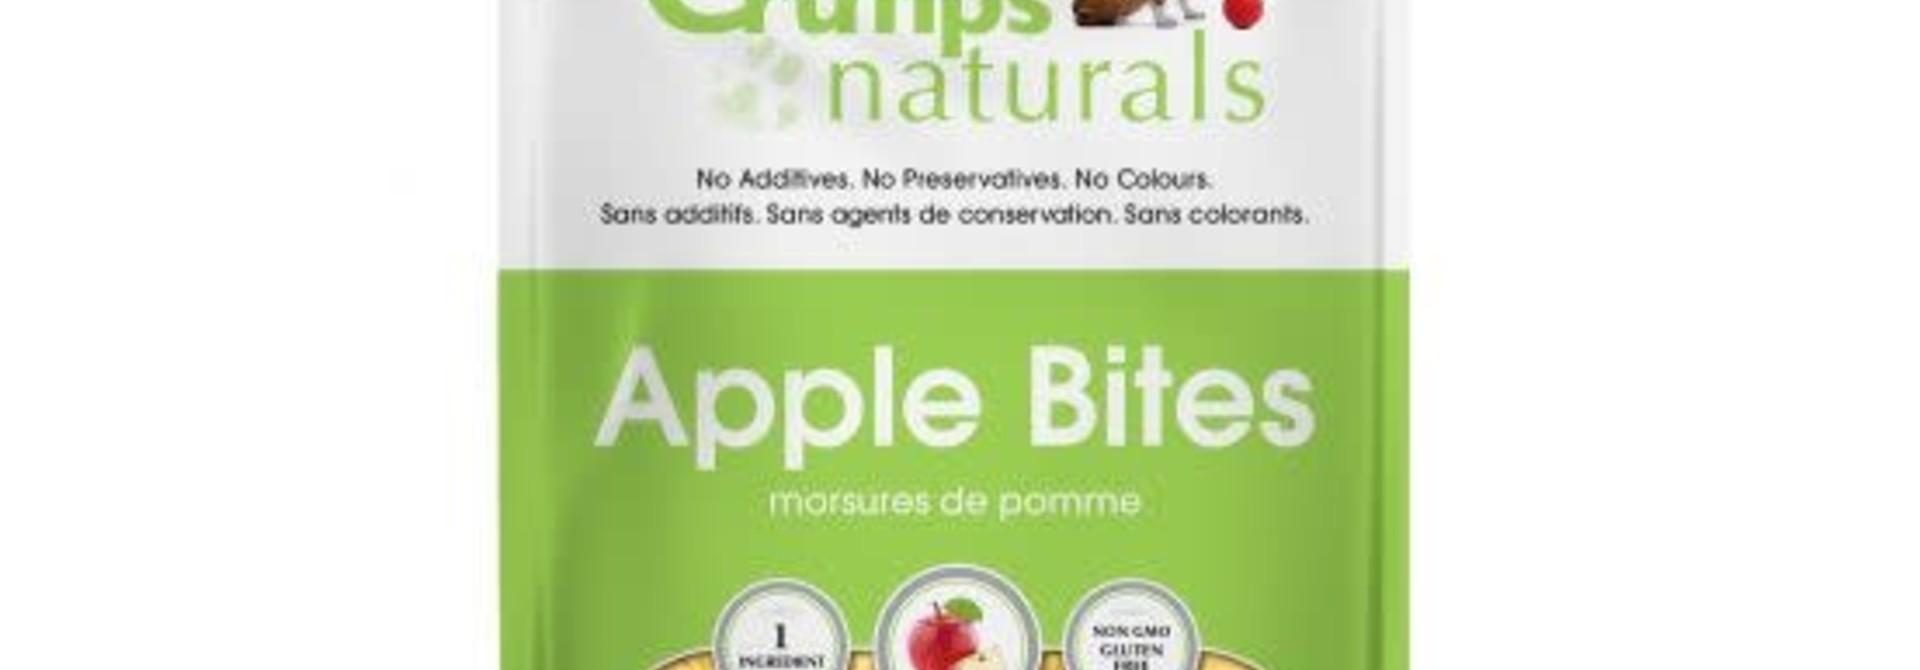 Crumps Apple Bites 1.6oz